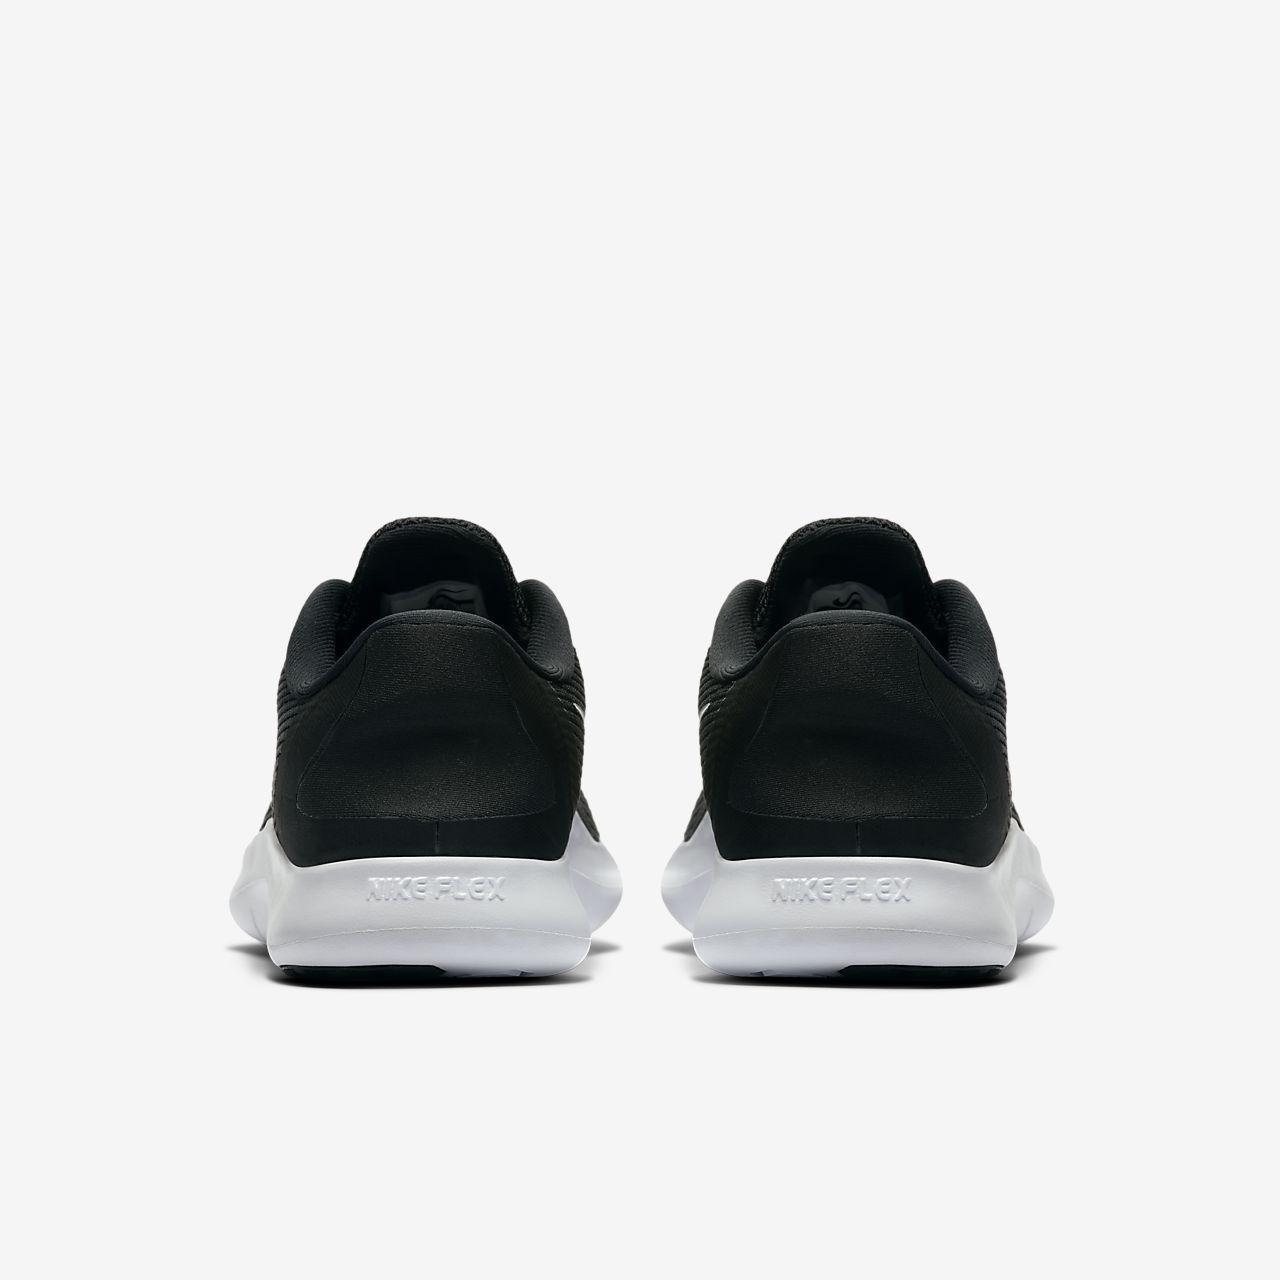 watch dea08 1d819 Calzado de running para mujer Nike Flex RN 2018. Nike.com MX